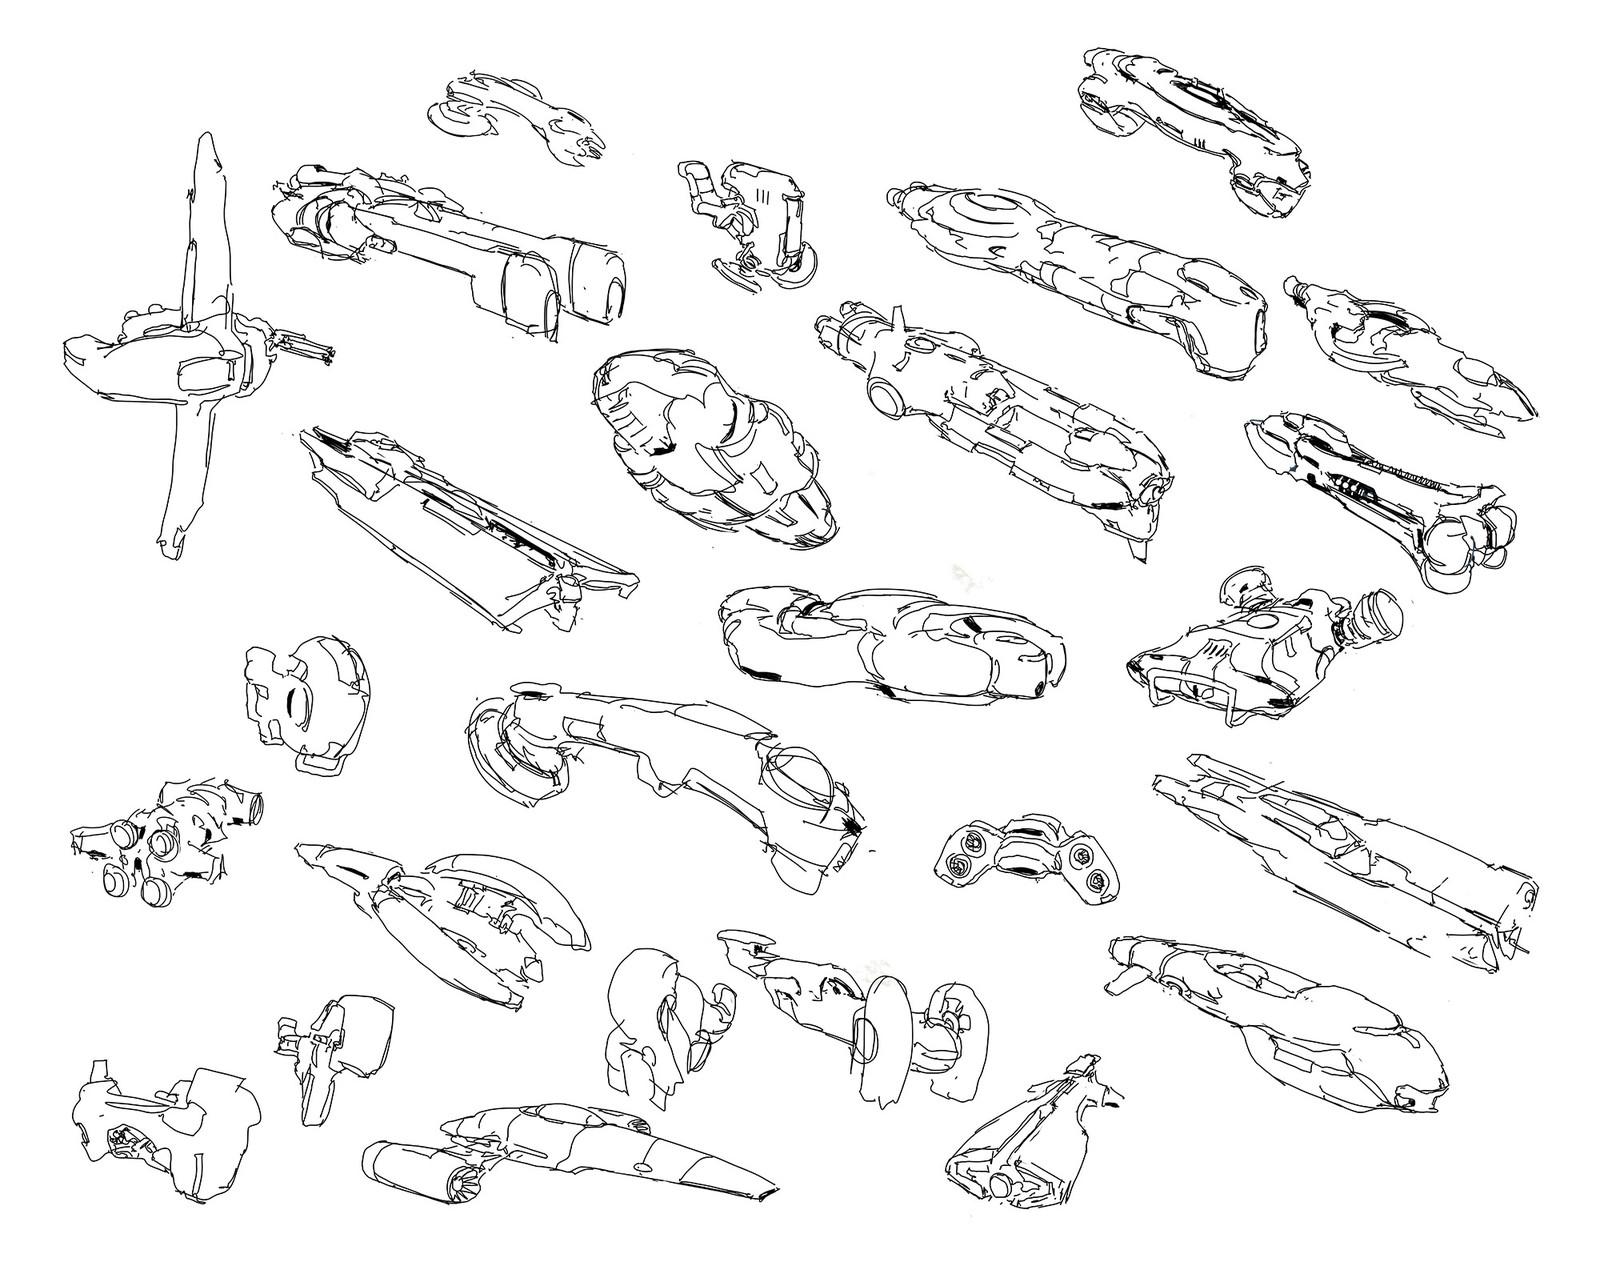 spaceship doodles